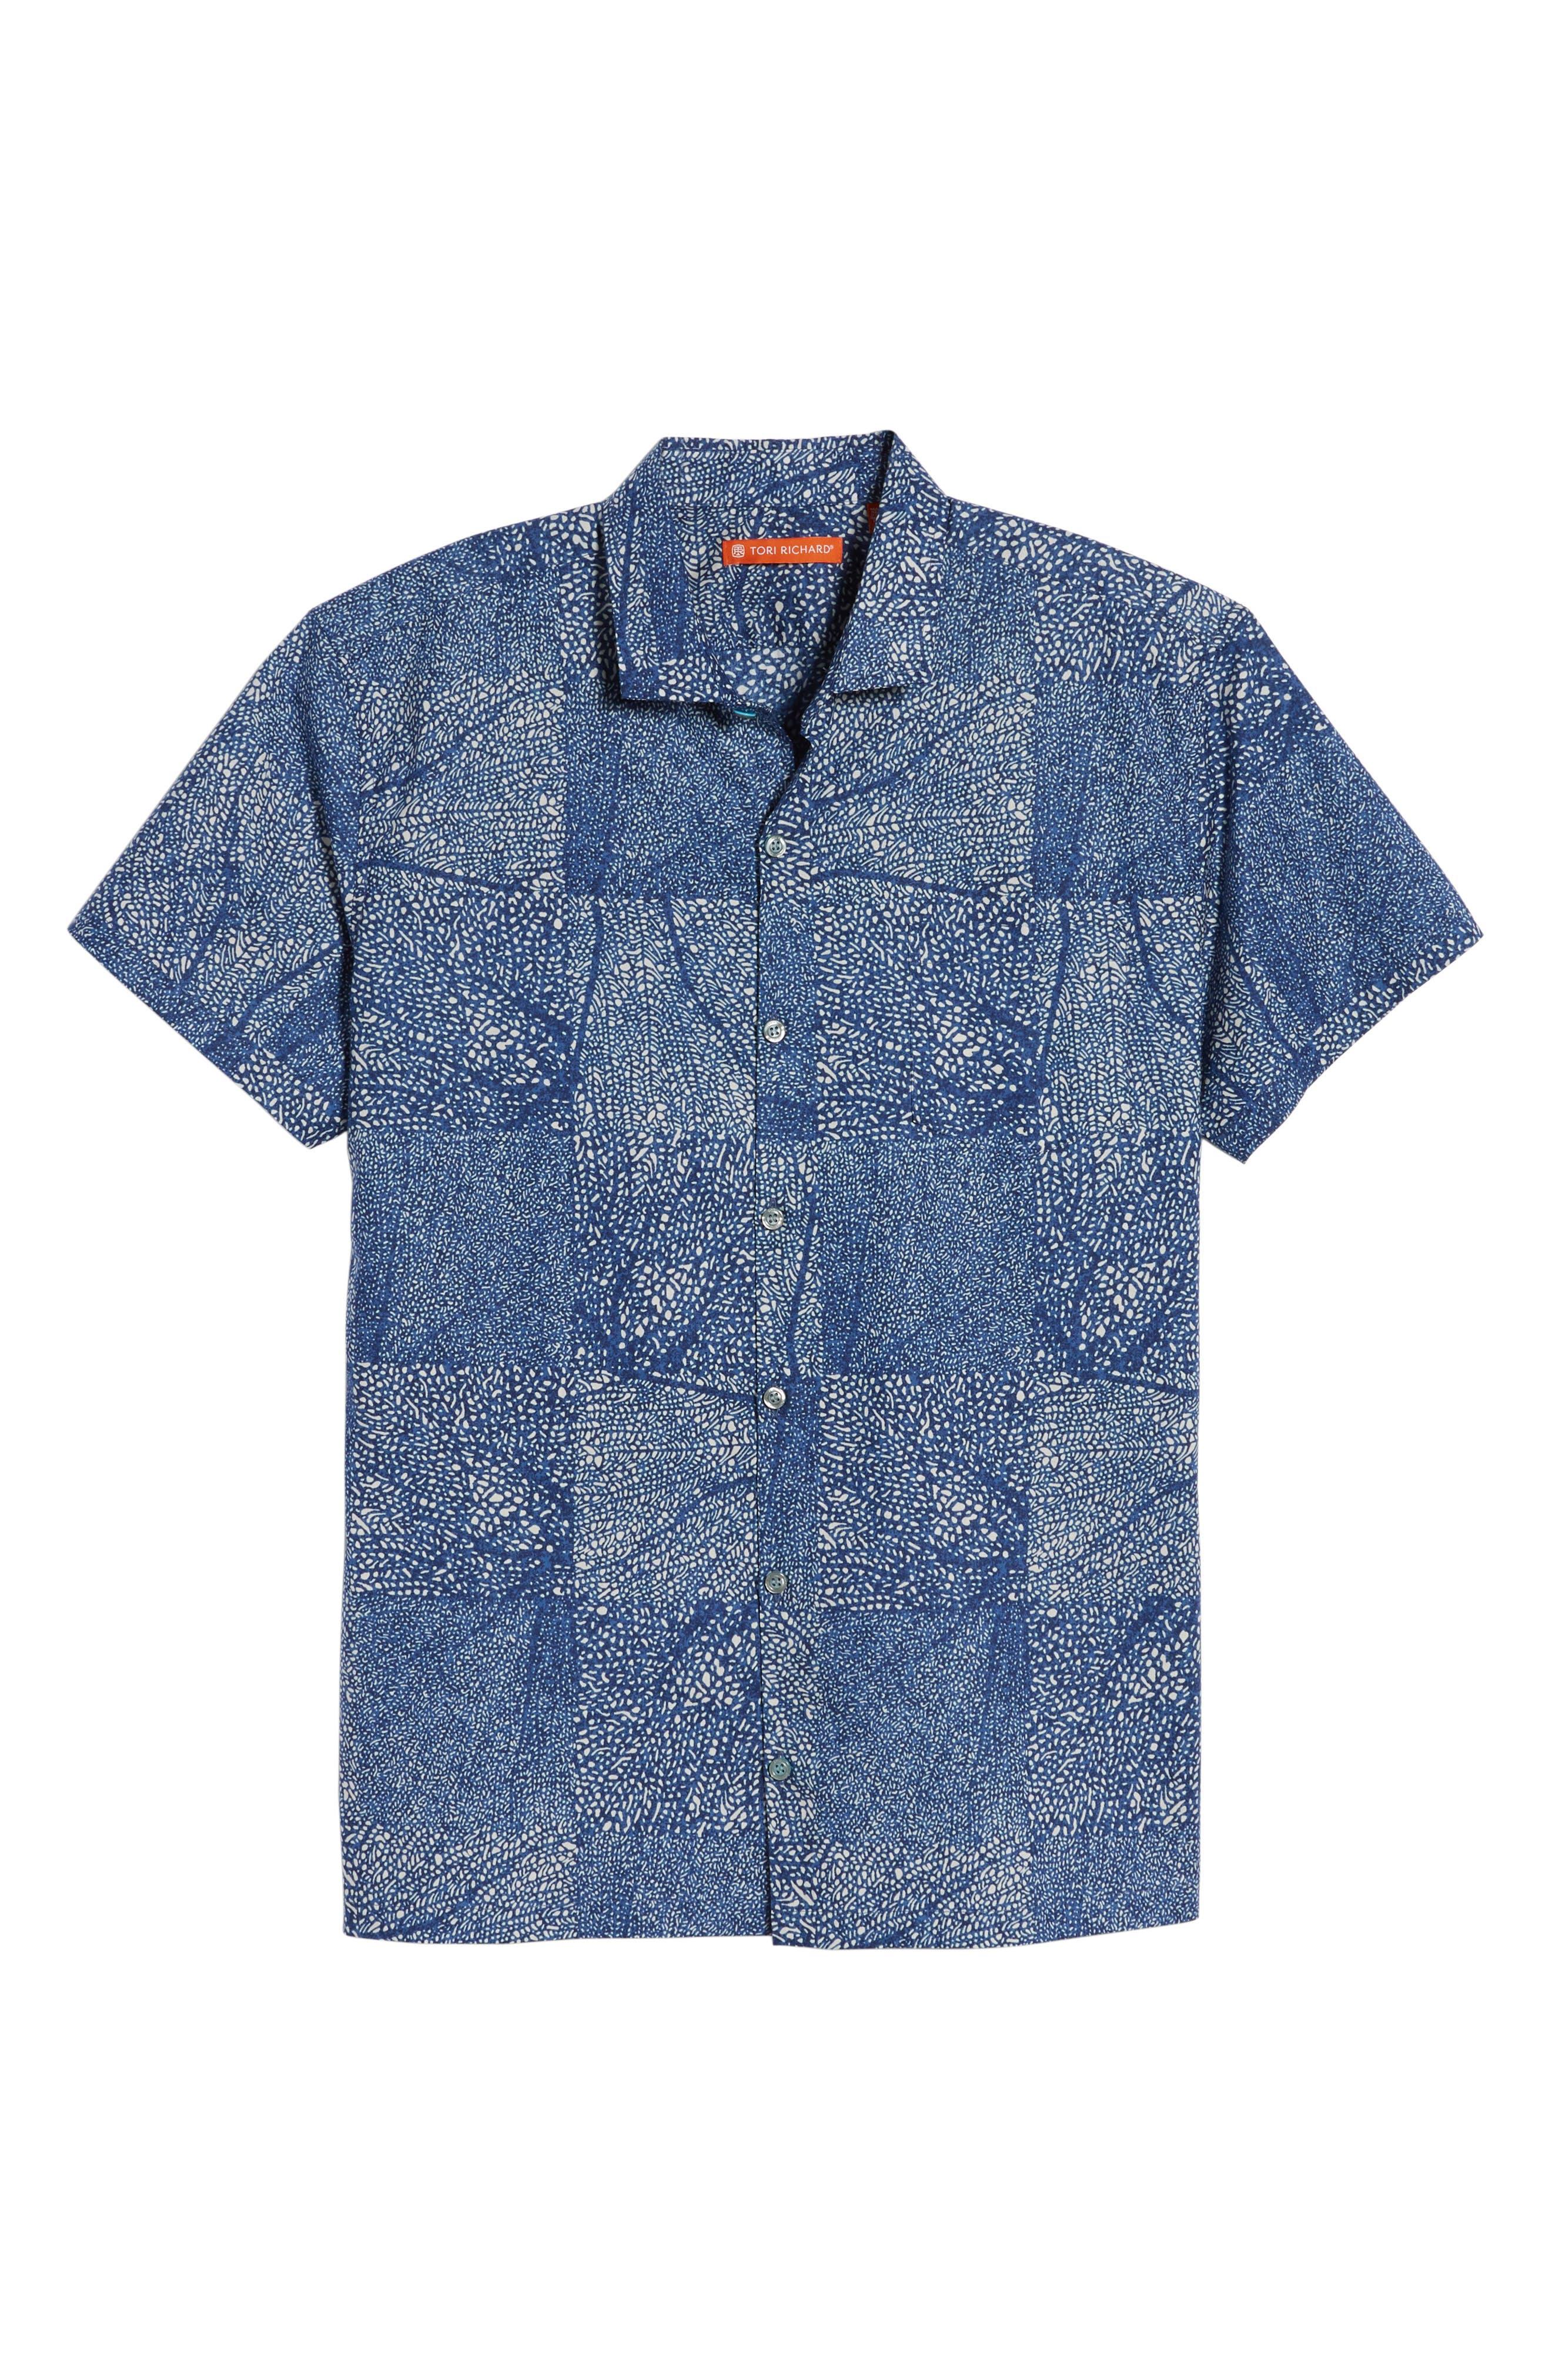 Black Coral Trim Fit Camp Shirt,                             Alternate thumbnail 6, color,                             Navy